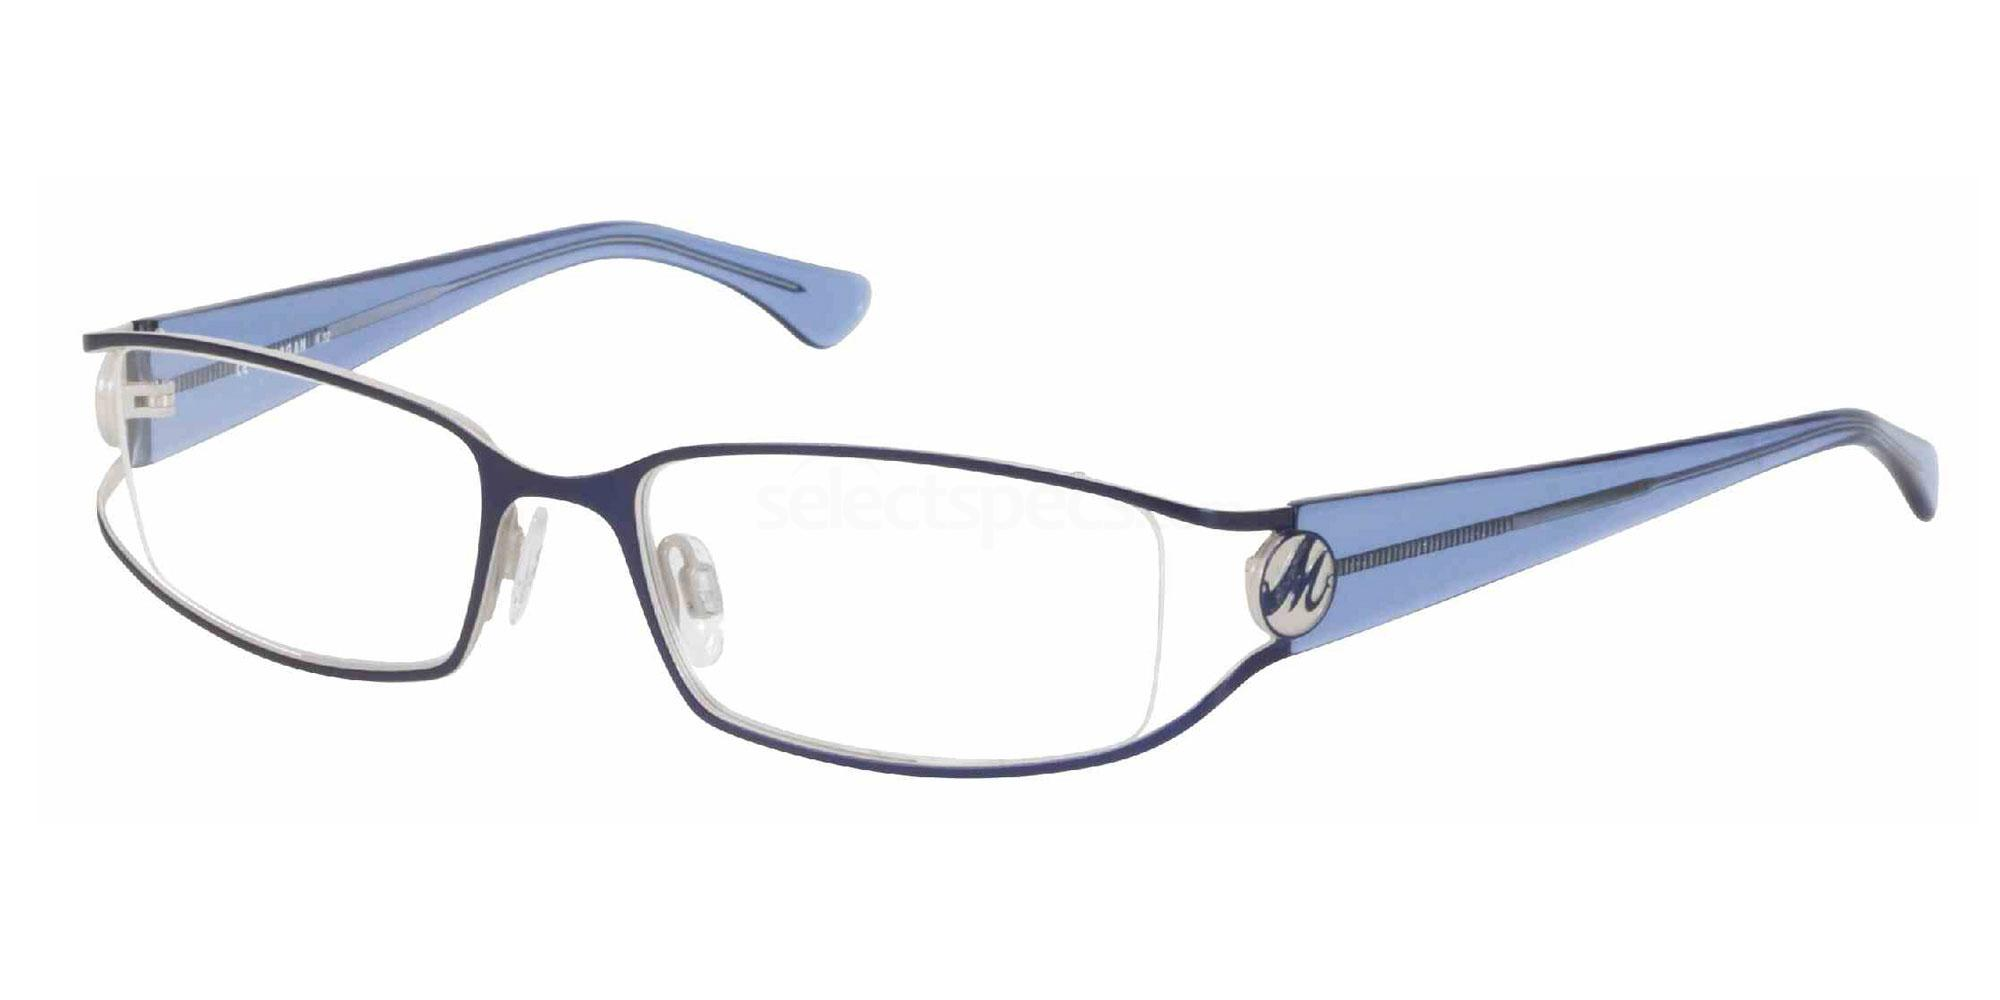 379 203106 Glasses, MORGAN Eyewear